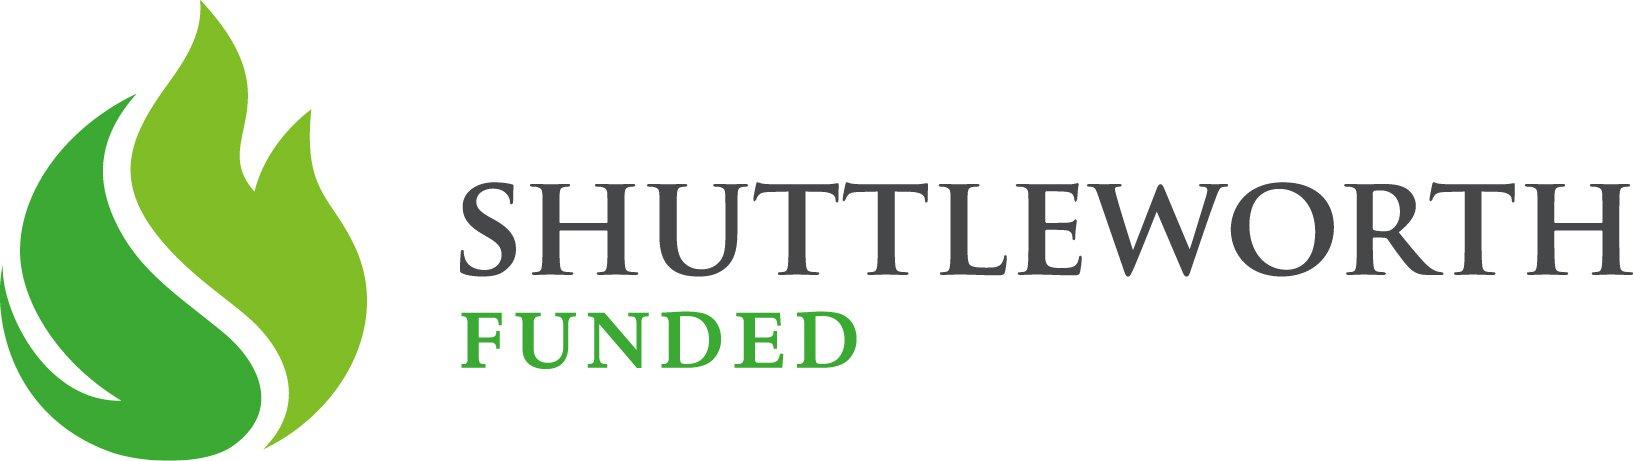 Shuttleworth foundation flash grant - Shuttleworth funded badge